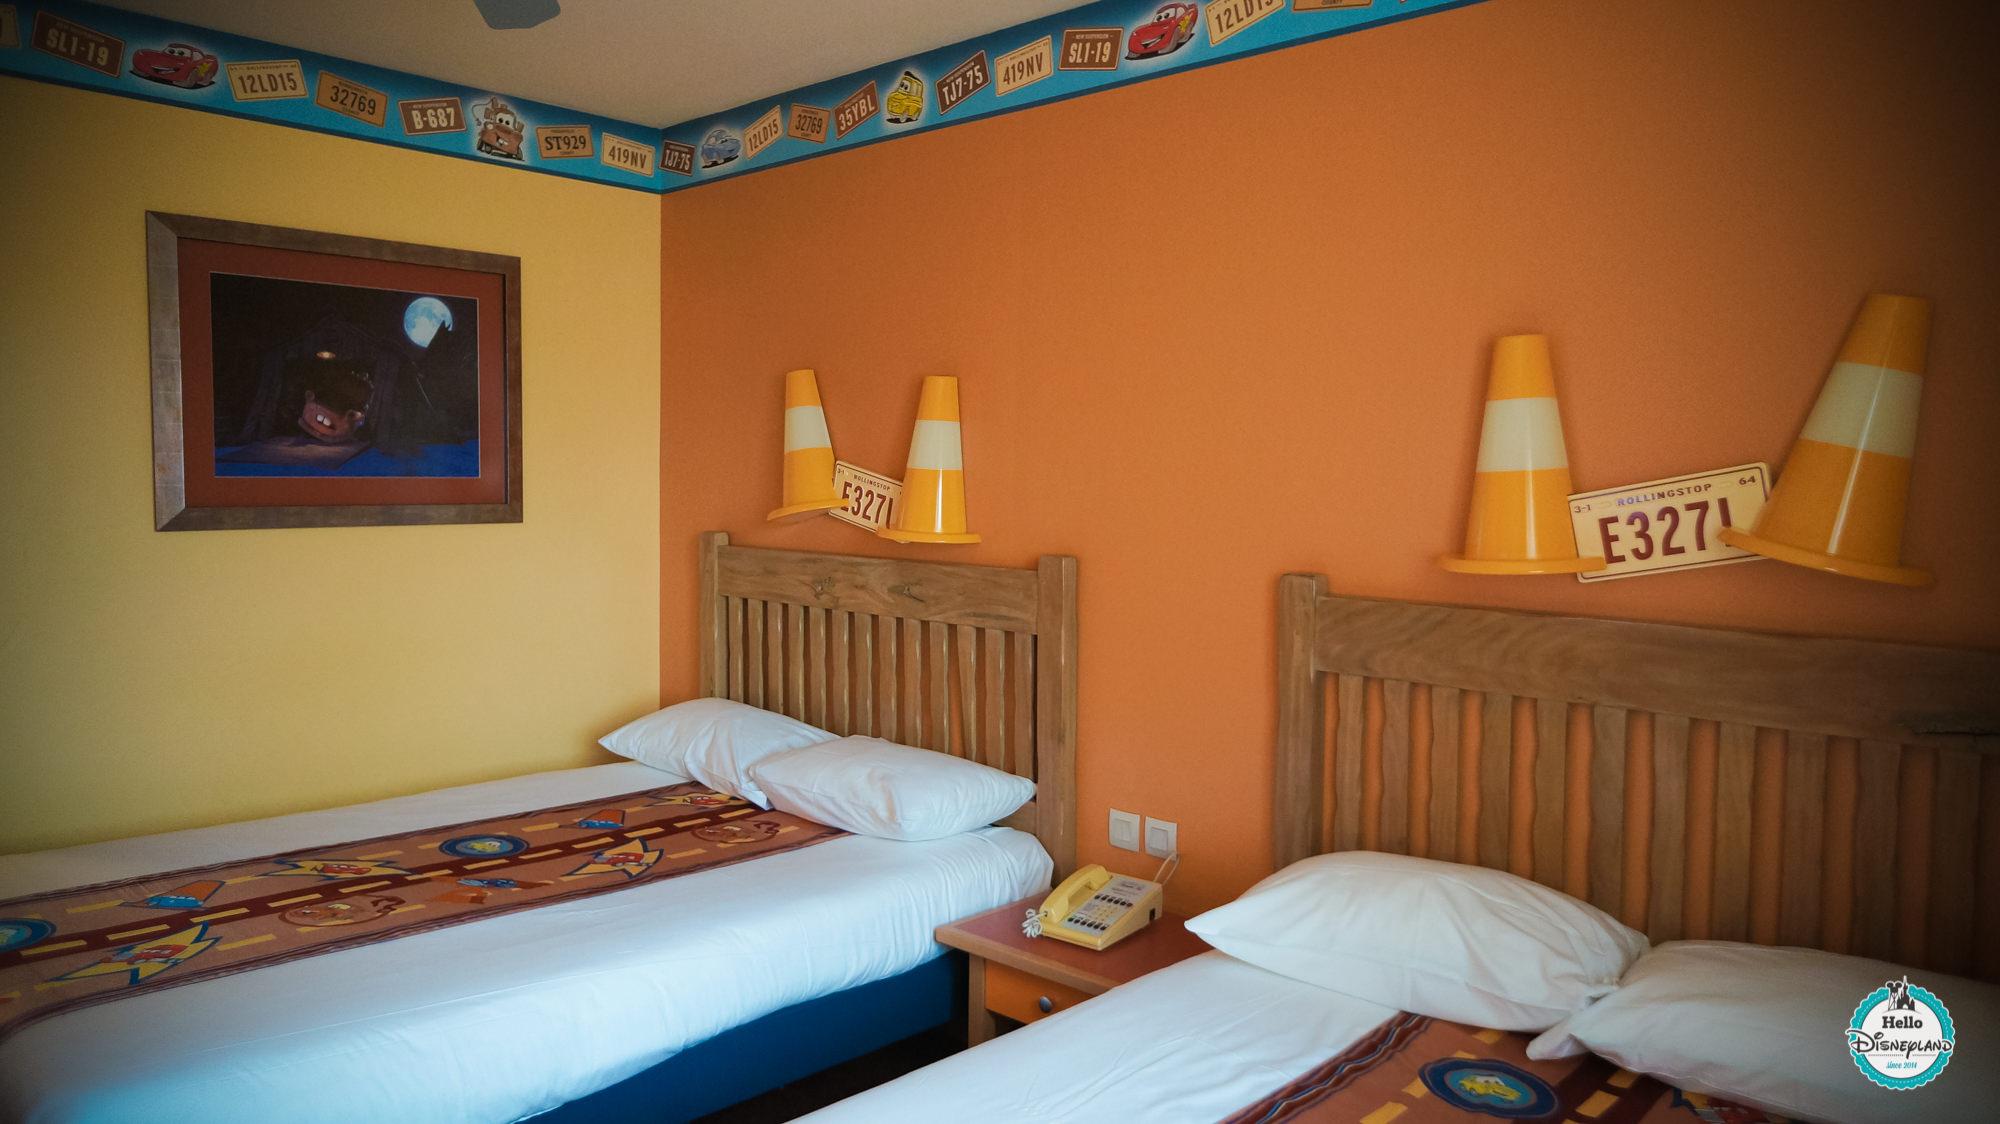 Hotel Santa Fe Disney Restaurant